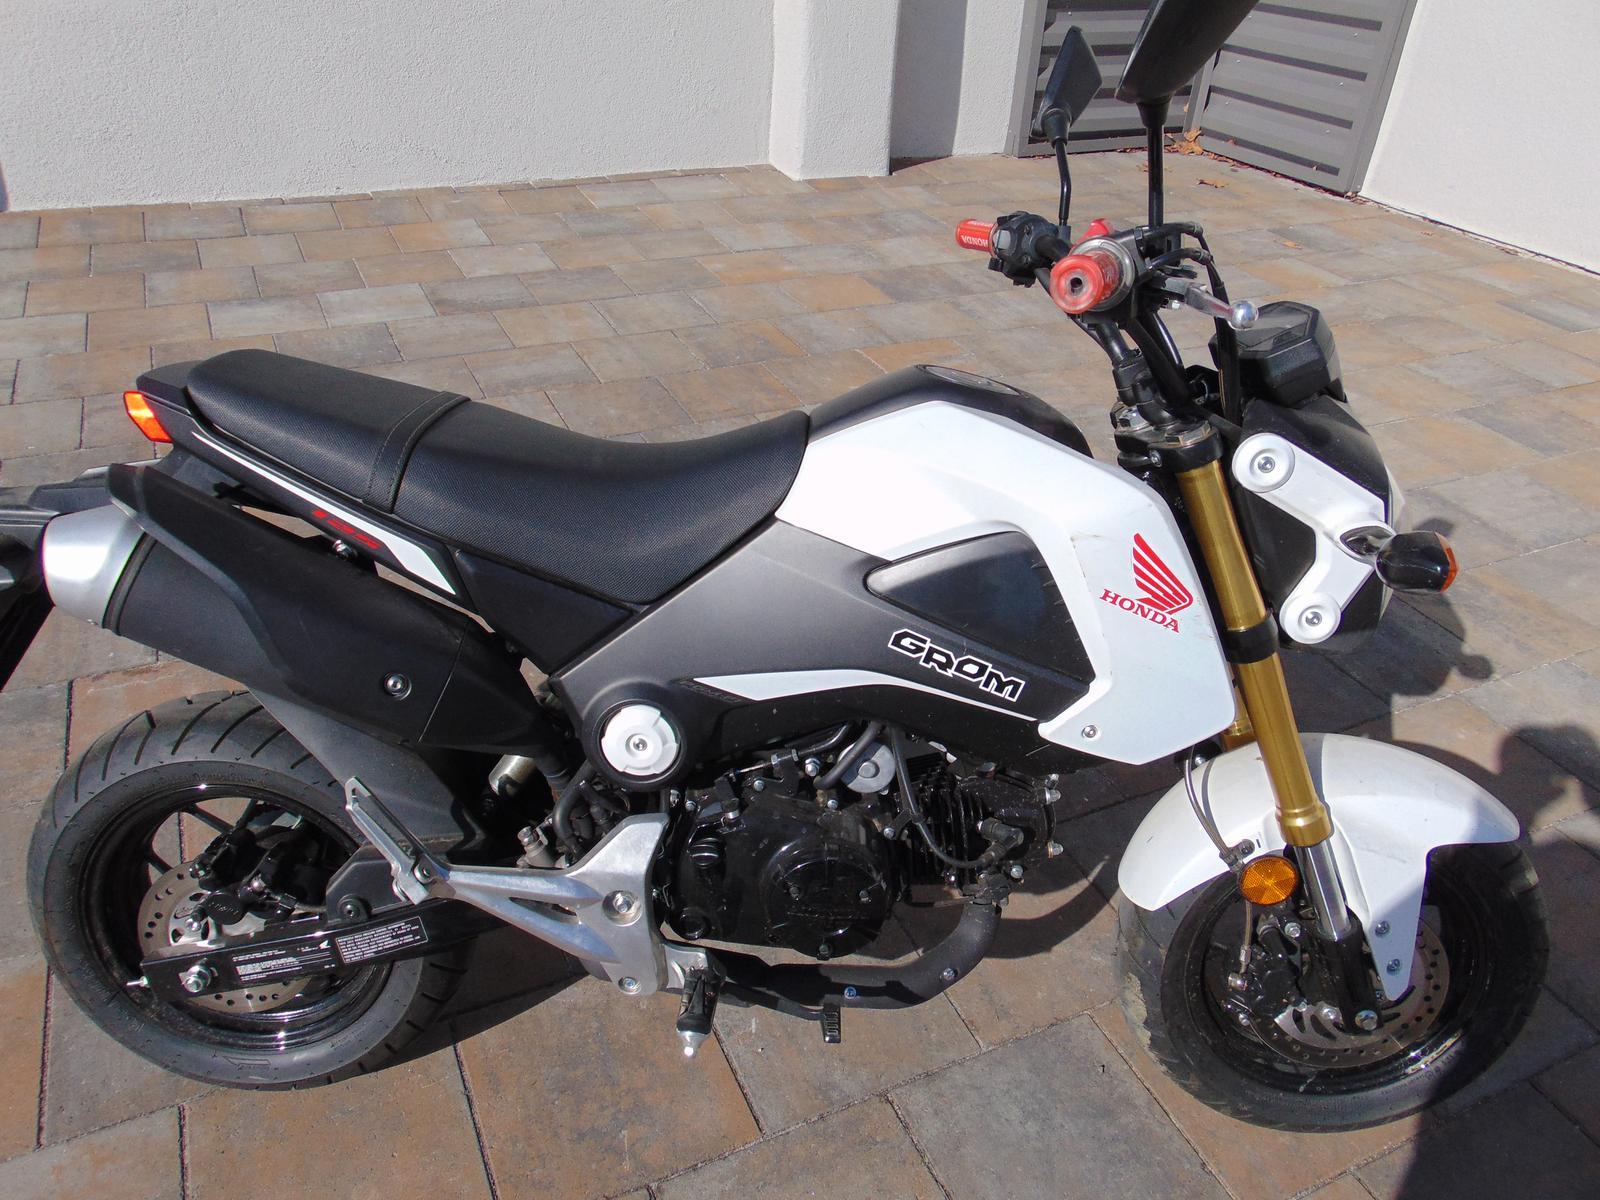 2015 Honda Grom 125e For Sale In Reno Nv Euro Cycle Reno Reno Nv